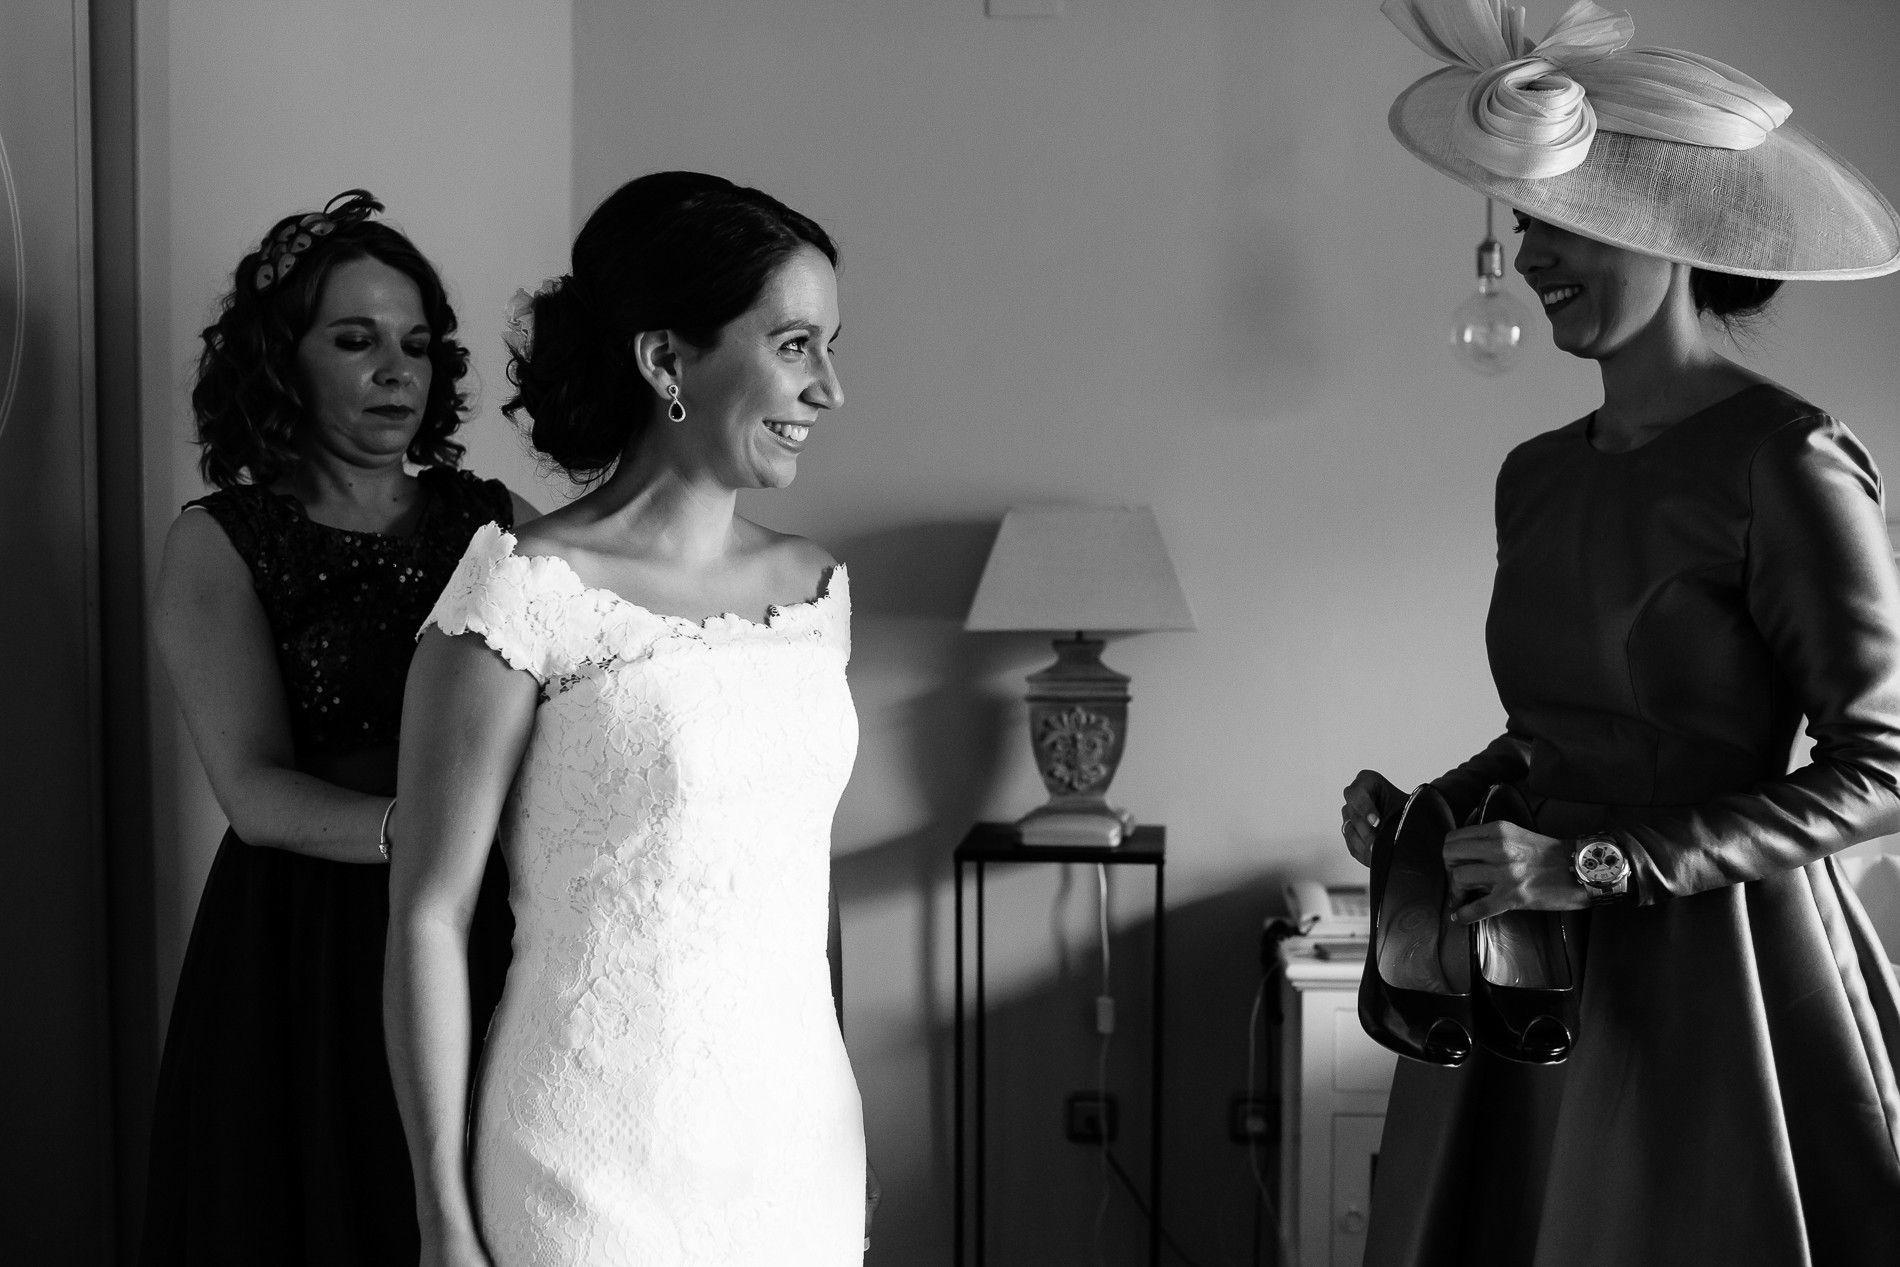 fotografo-de-boda-plasencia-07